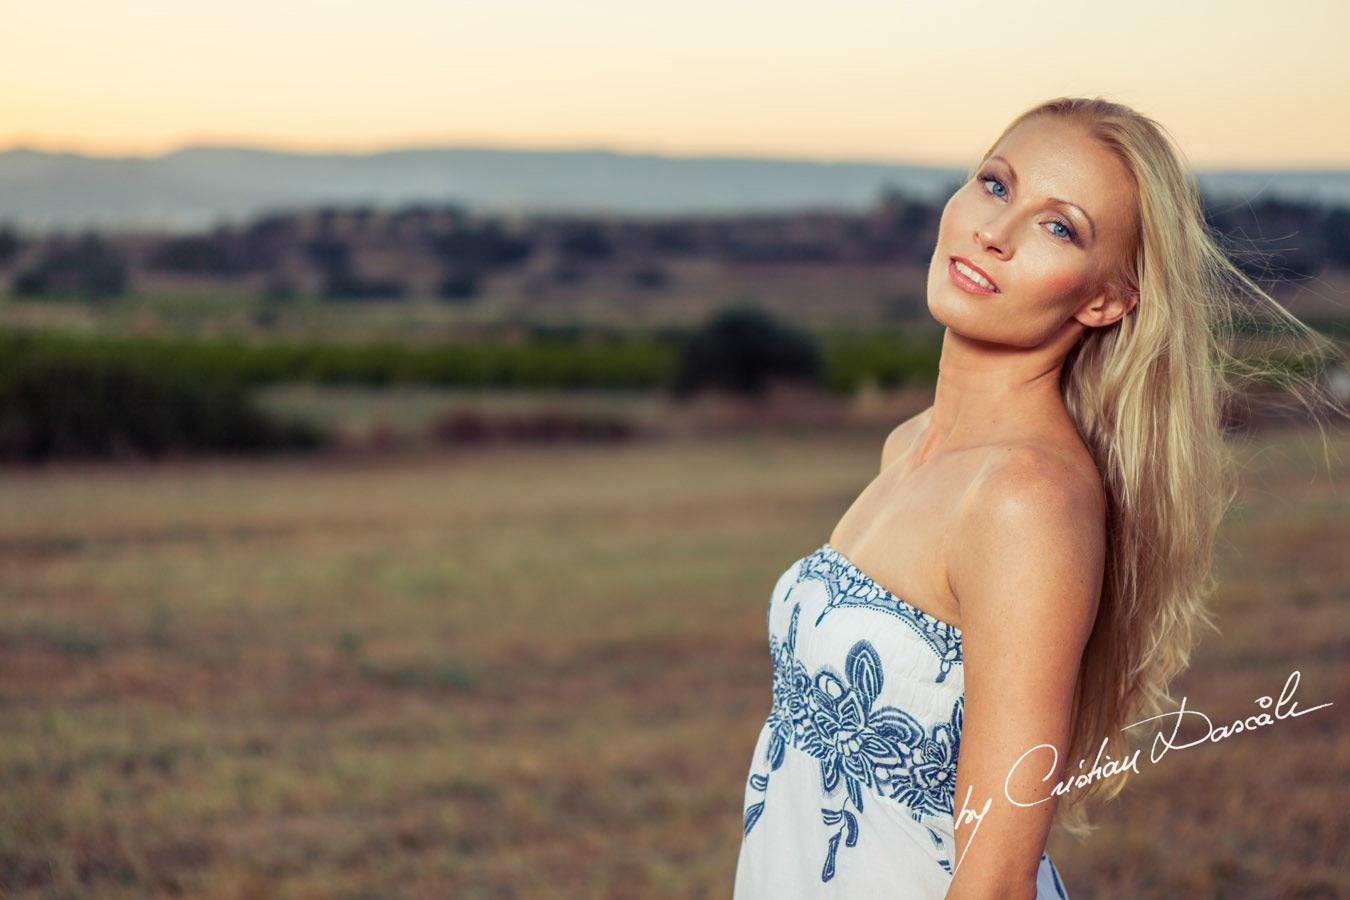 Cyprus Wedding Photographer - Polina & Cyprian Sun